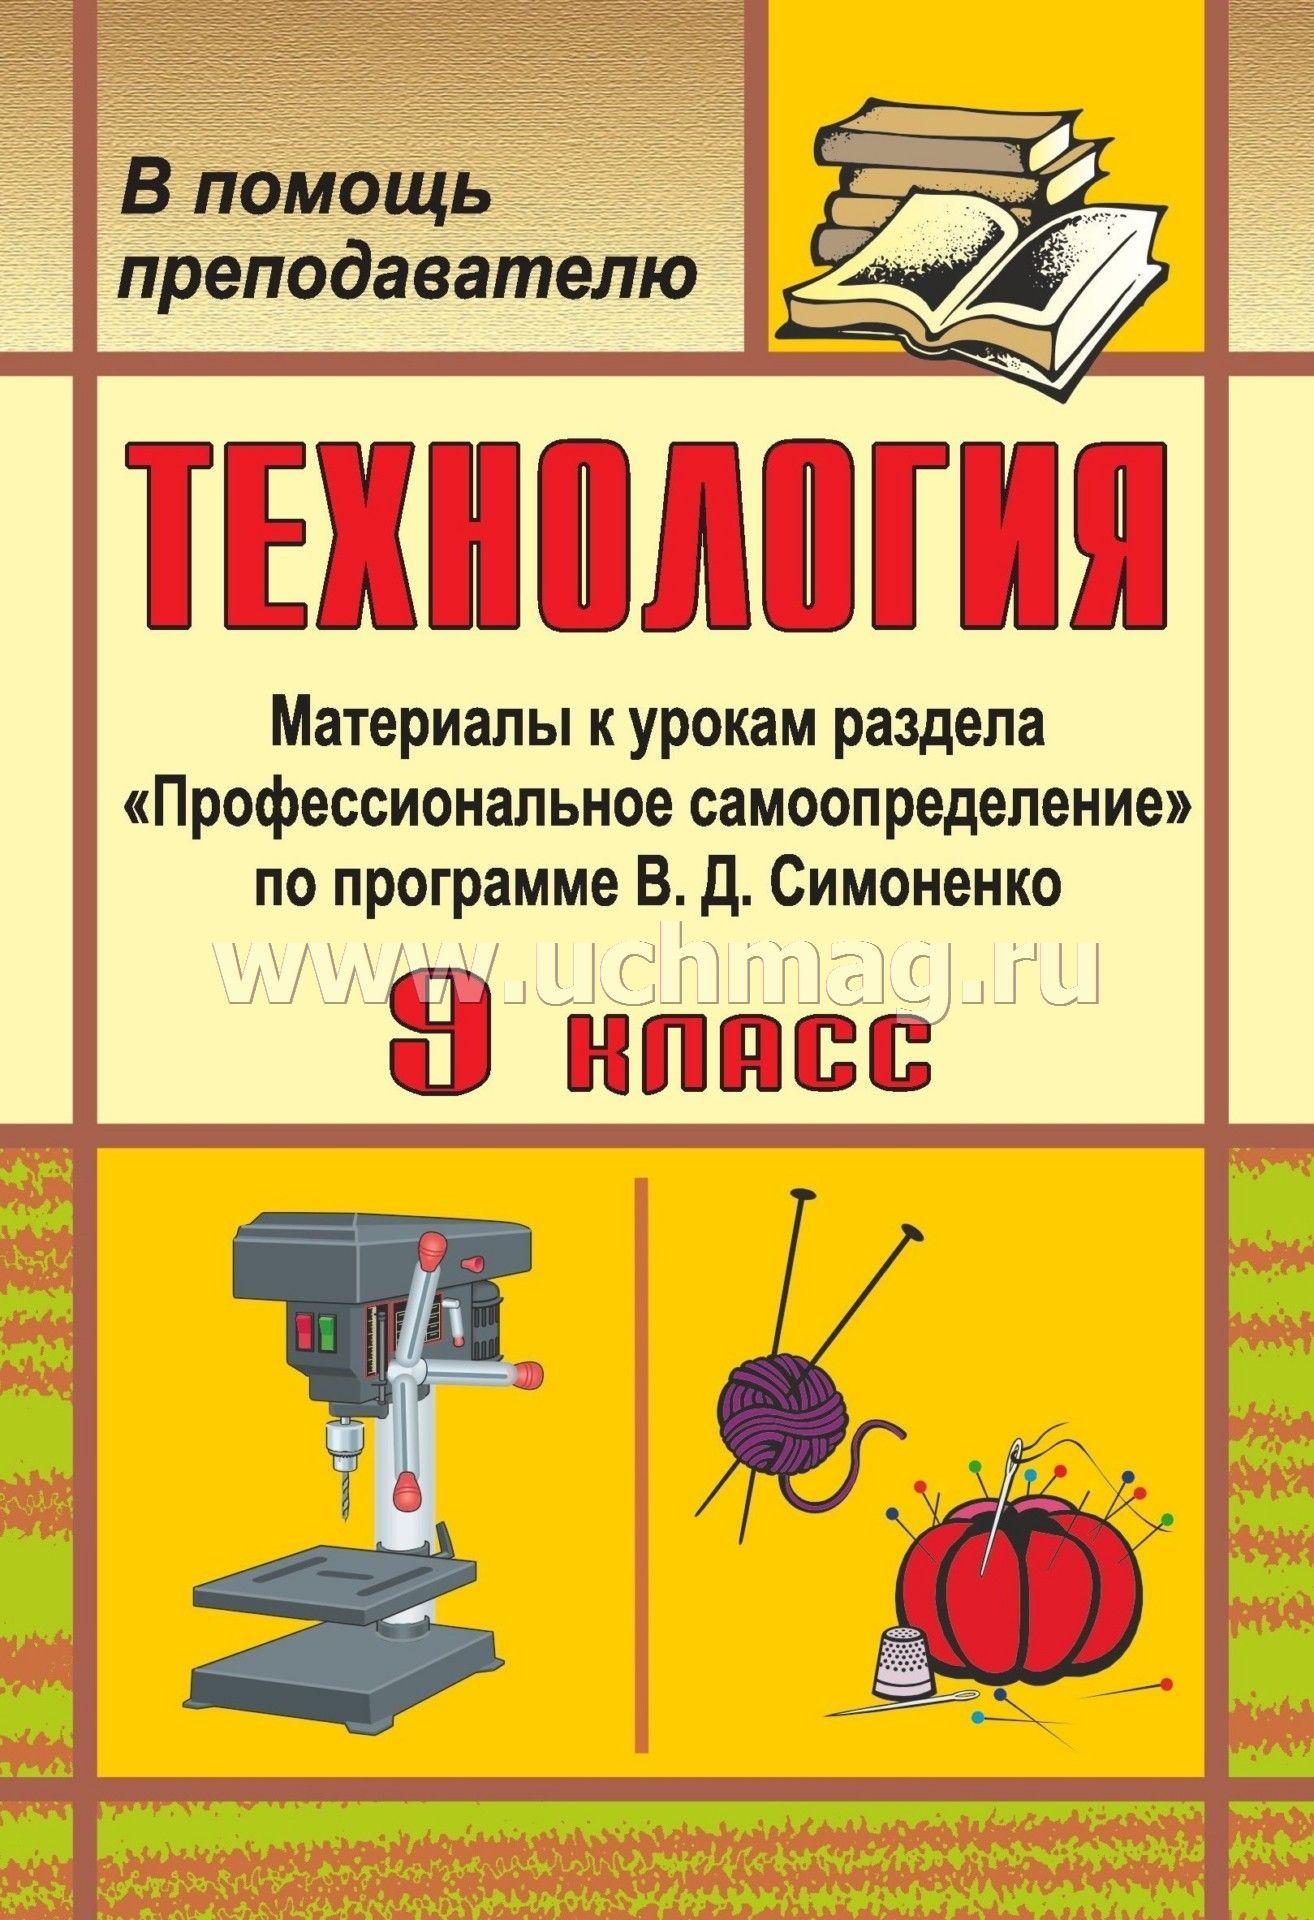 Технология 9 класс учебник симоненко в.д